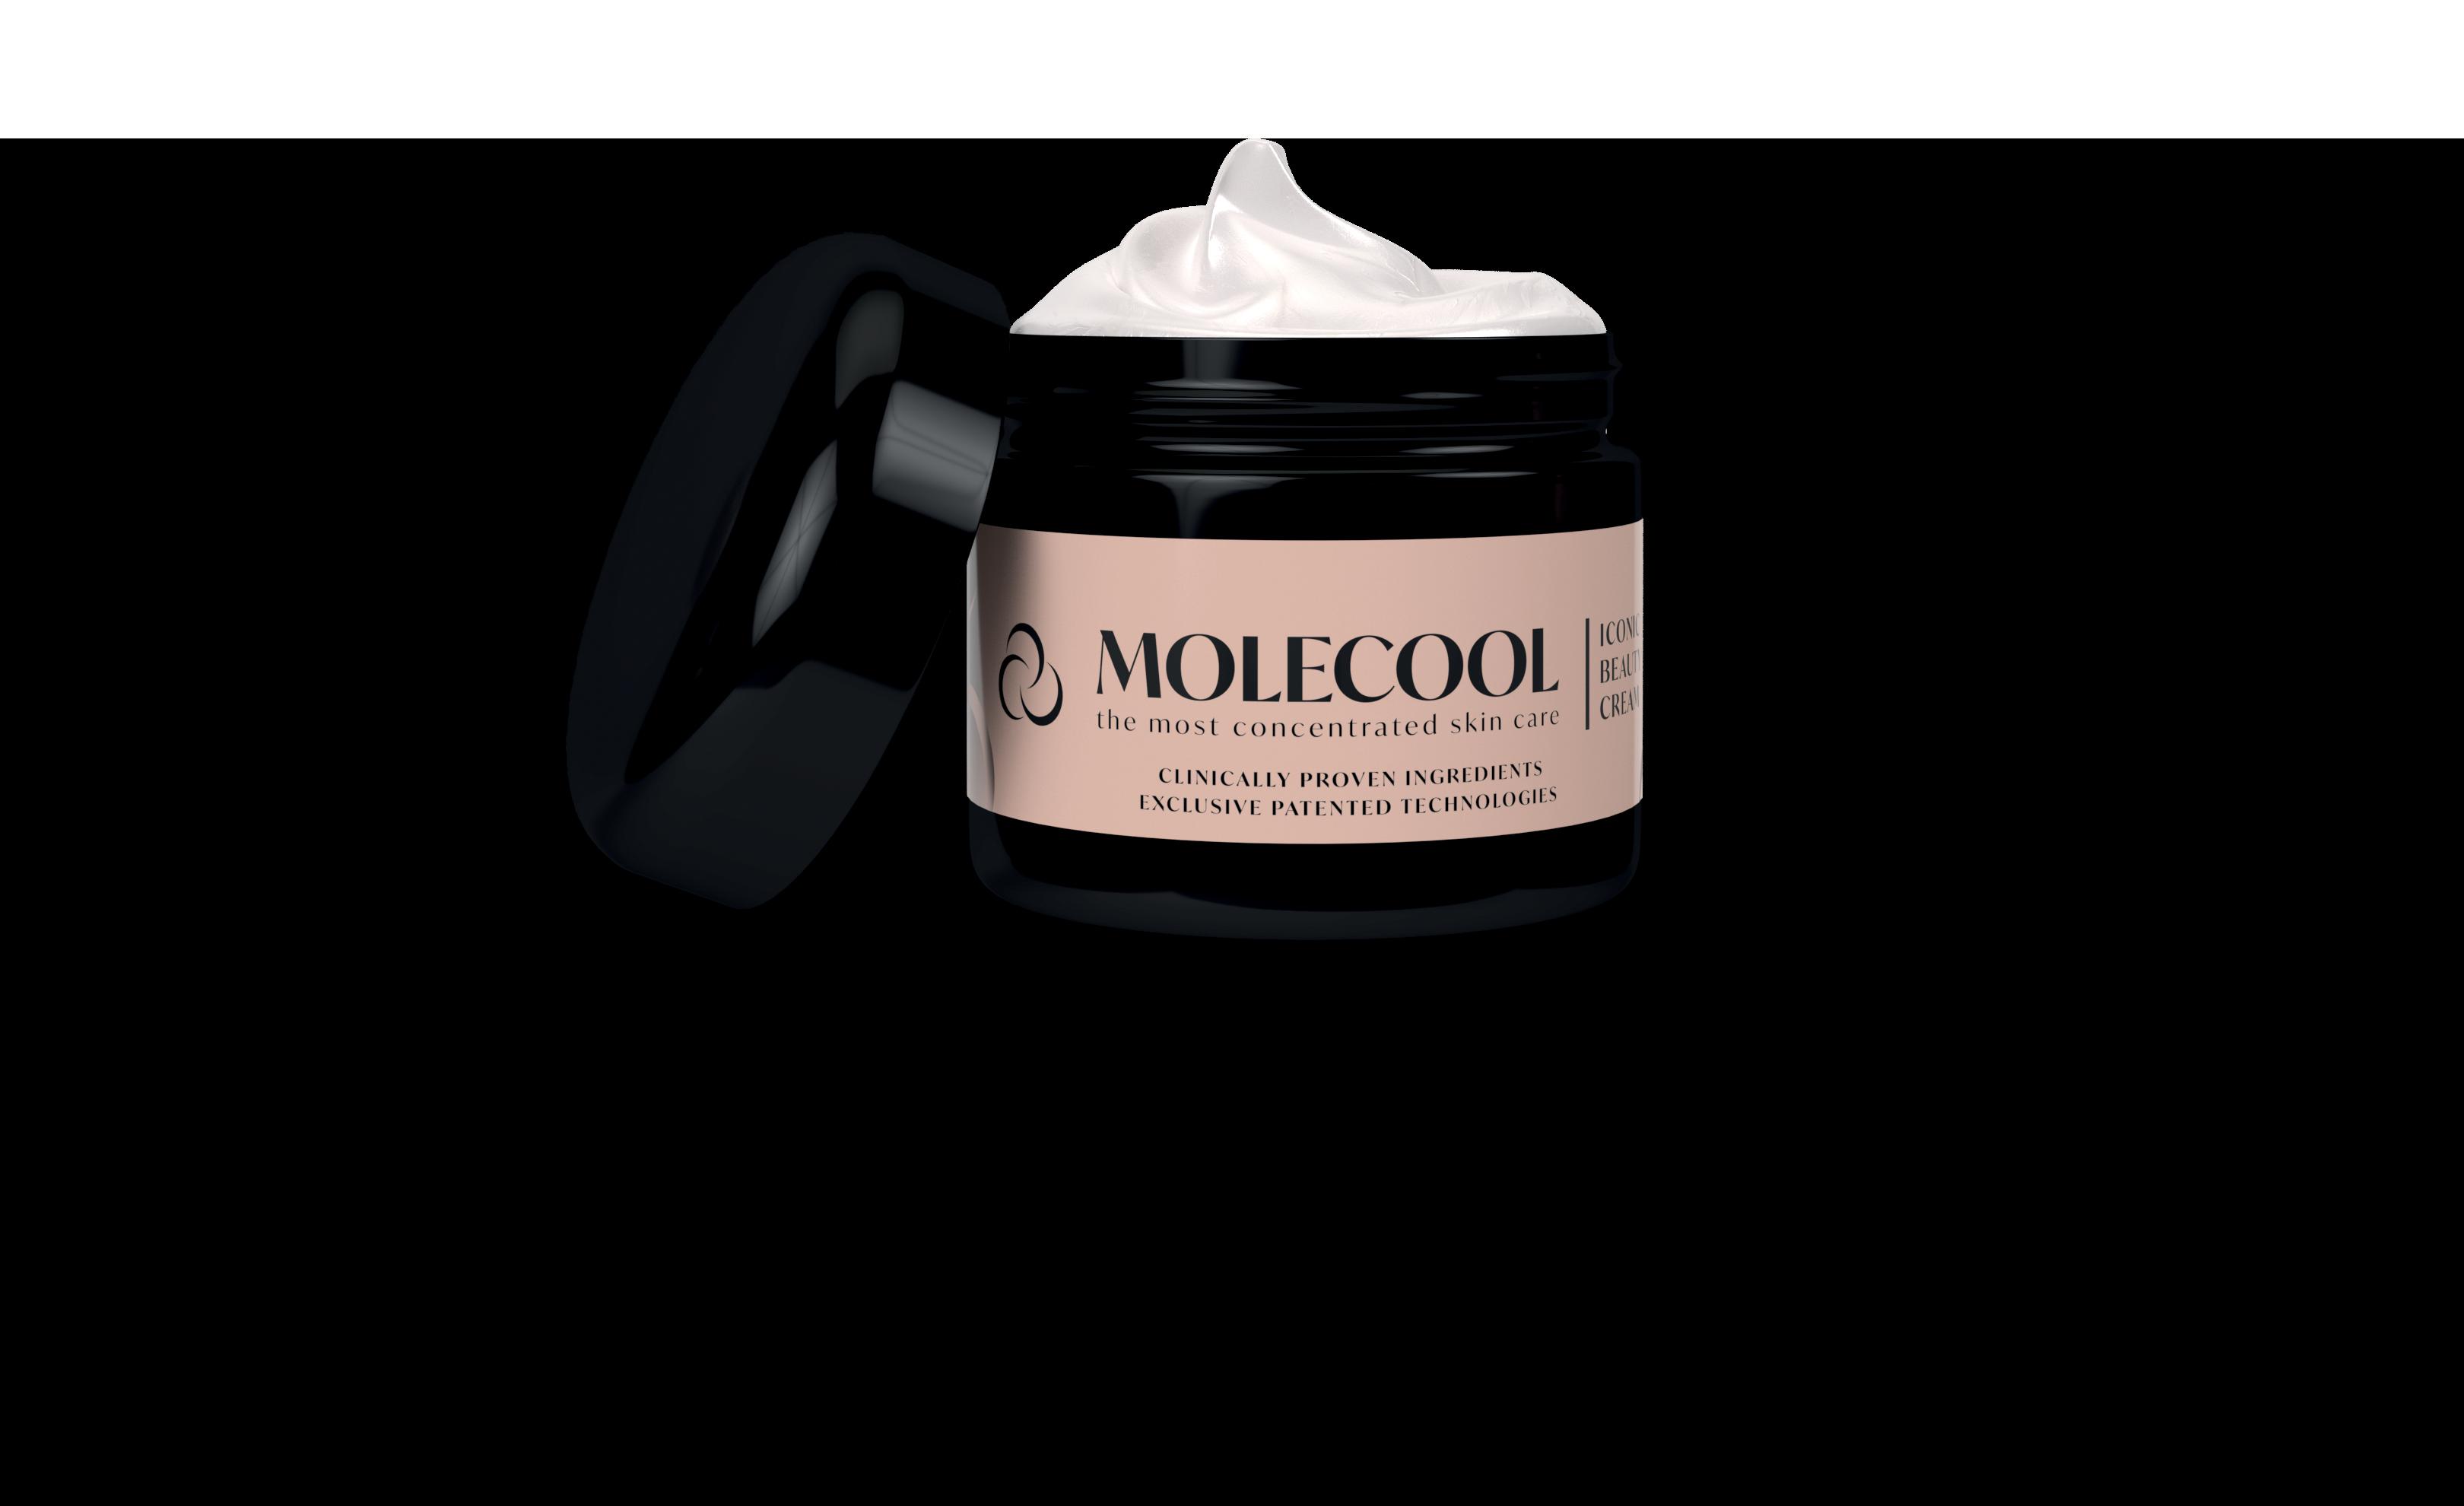 molecool iconic beauty cream